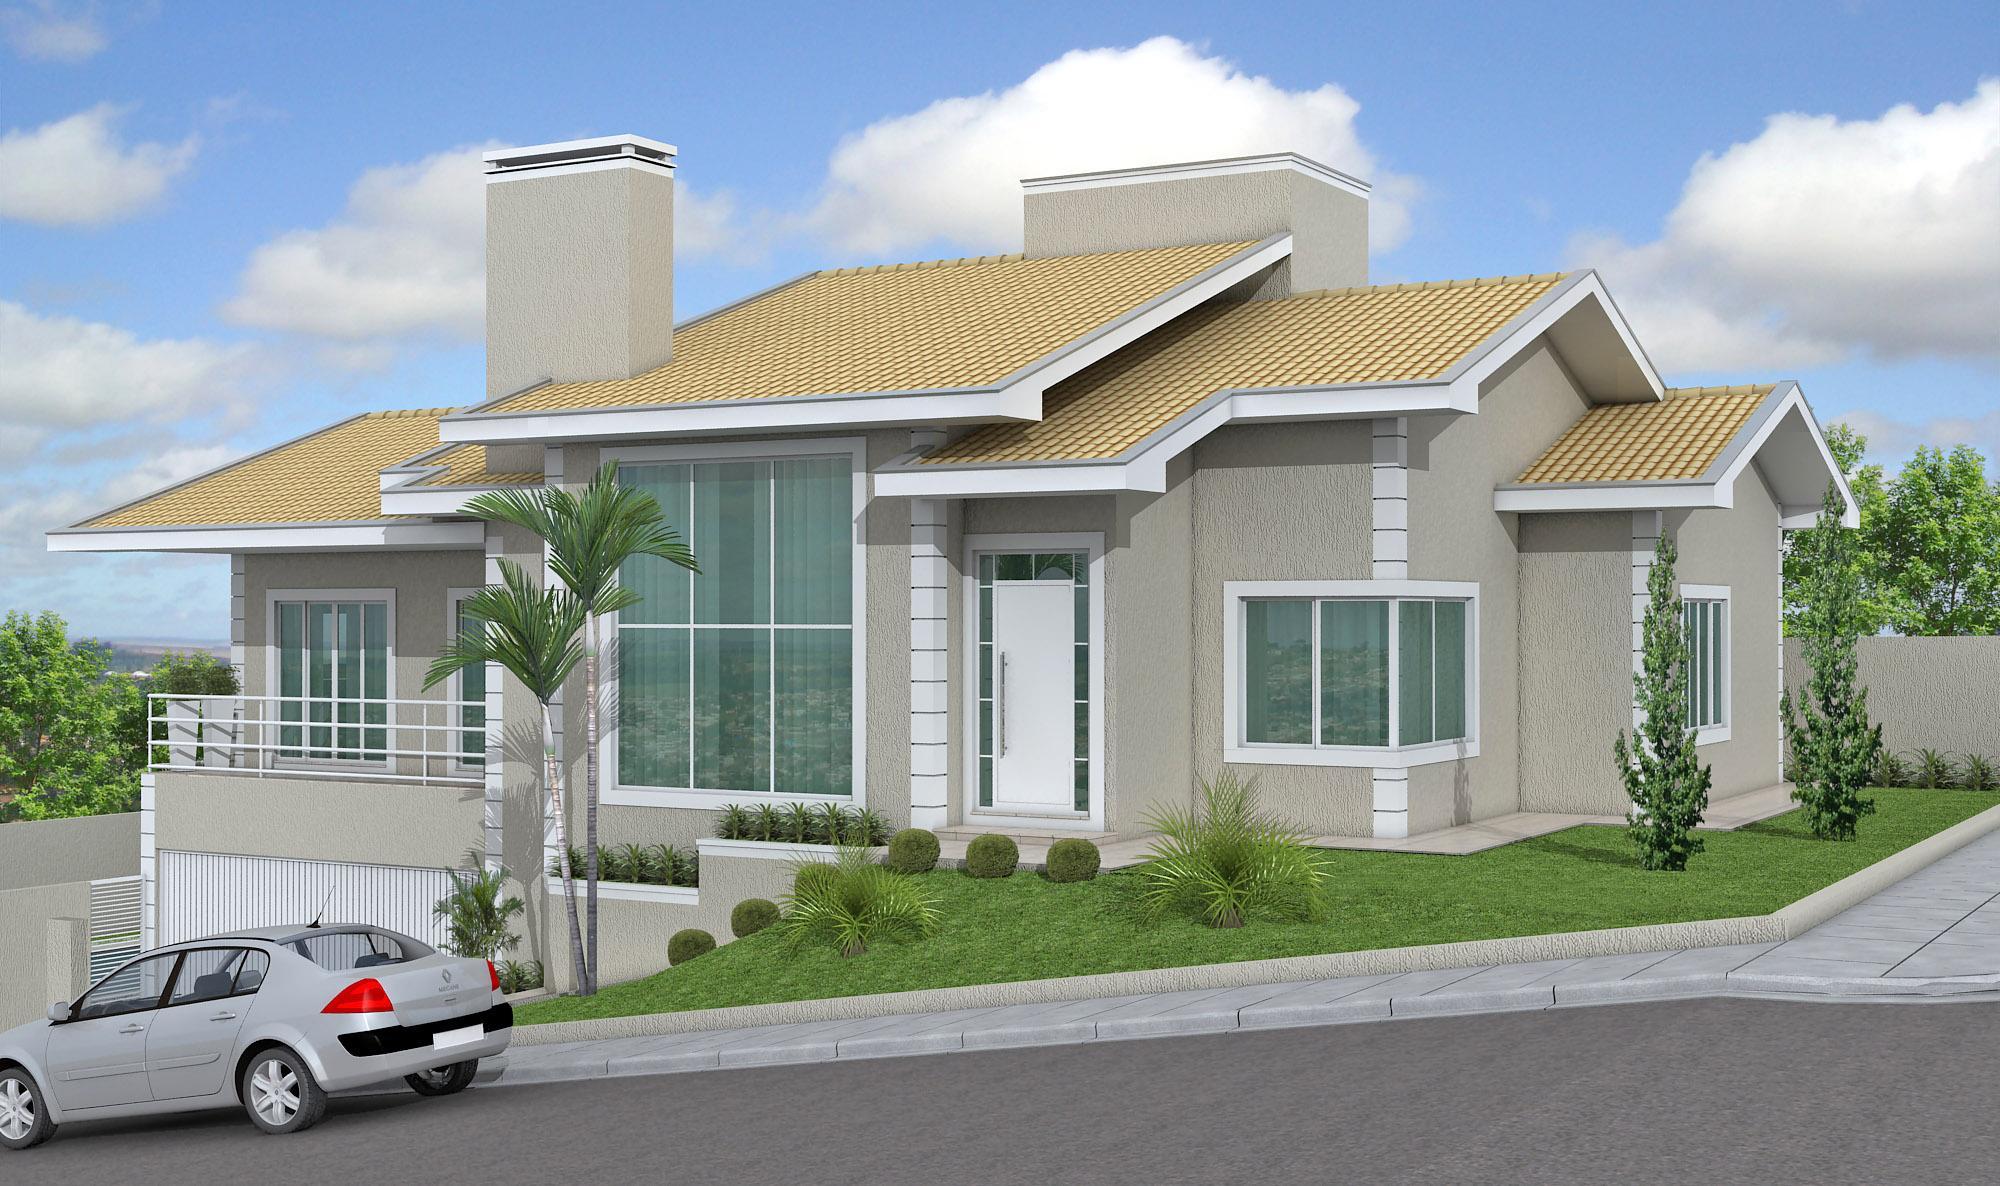 50 fachadas de casas de esquina lindas e inspiradoras for Casas modernas hermosas